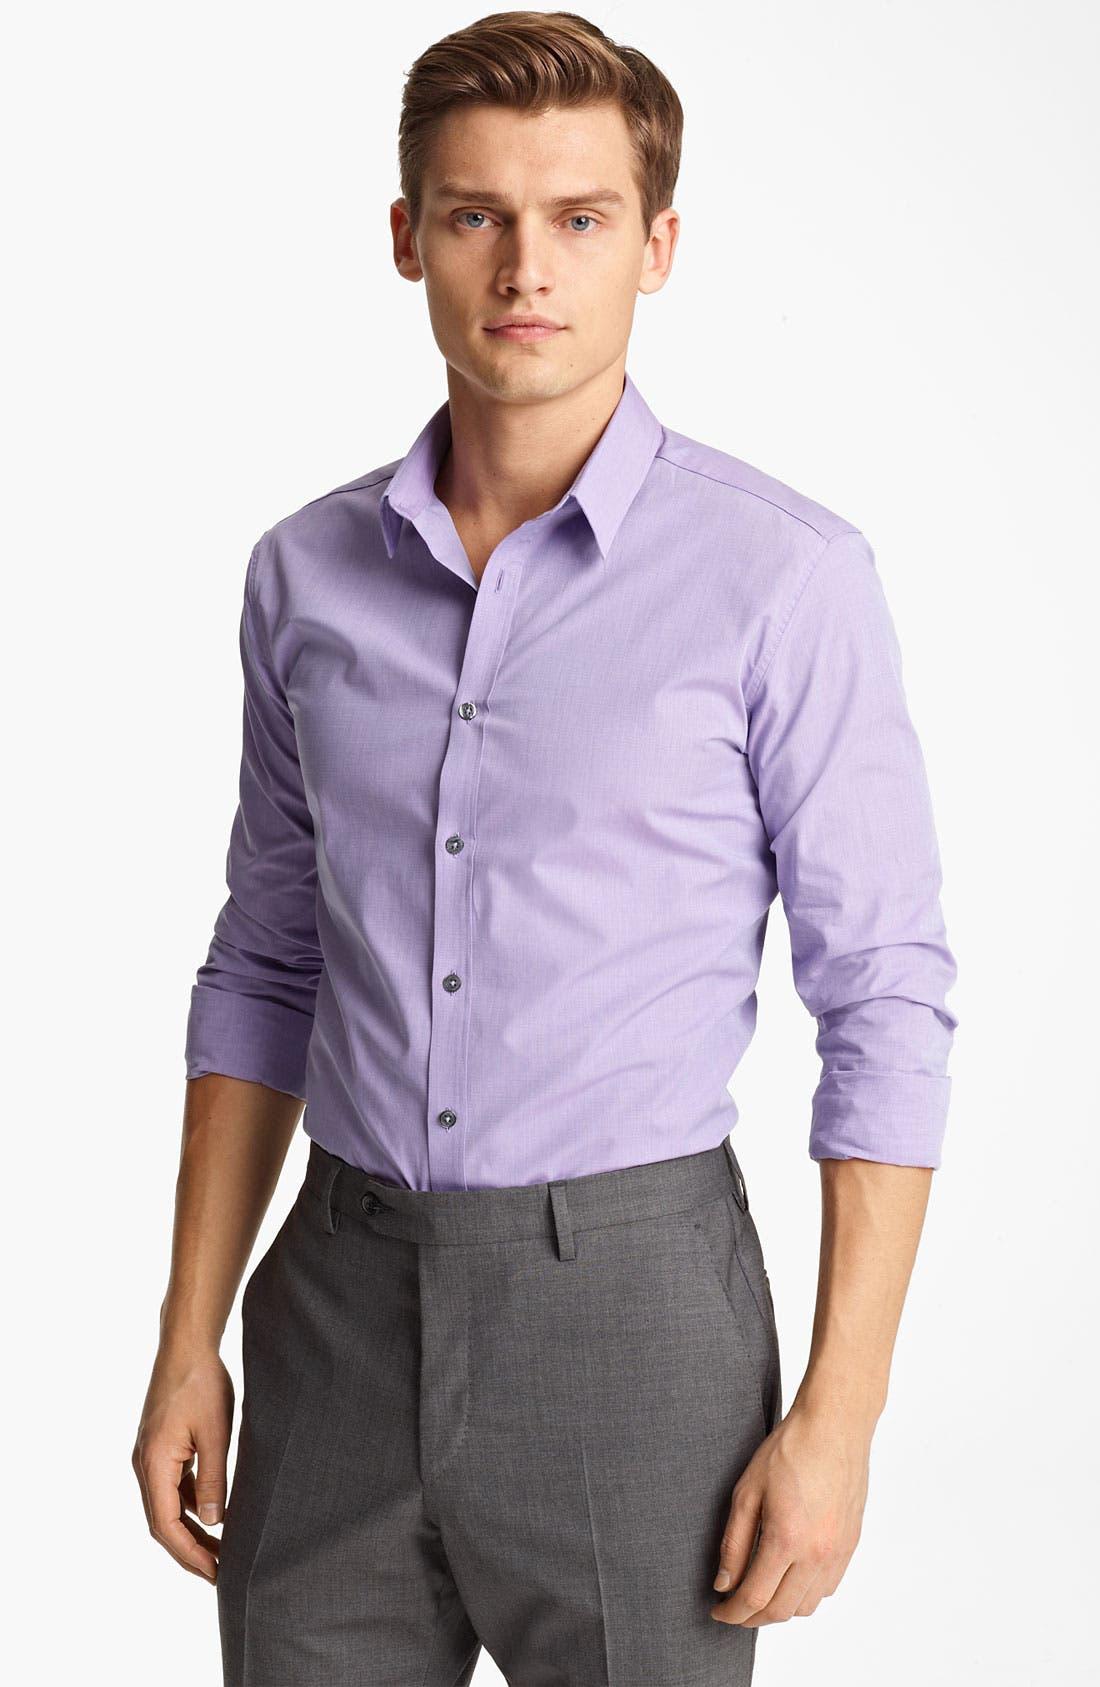 Alternate Image 1 Selected - PS Paul Smith Slim Fit Dress Shirt